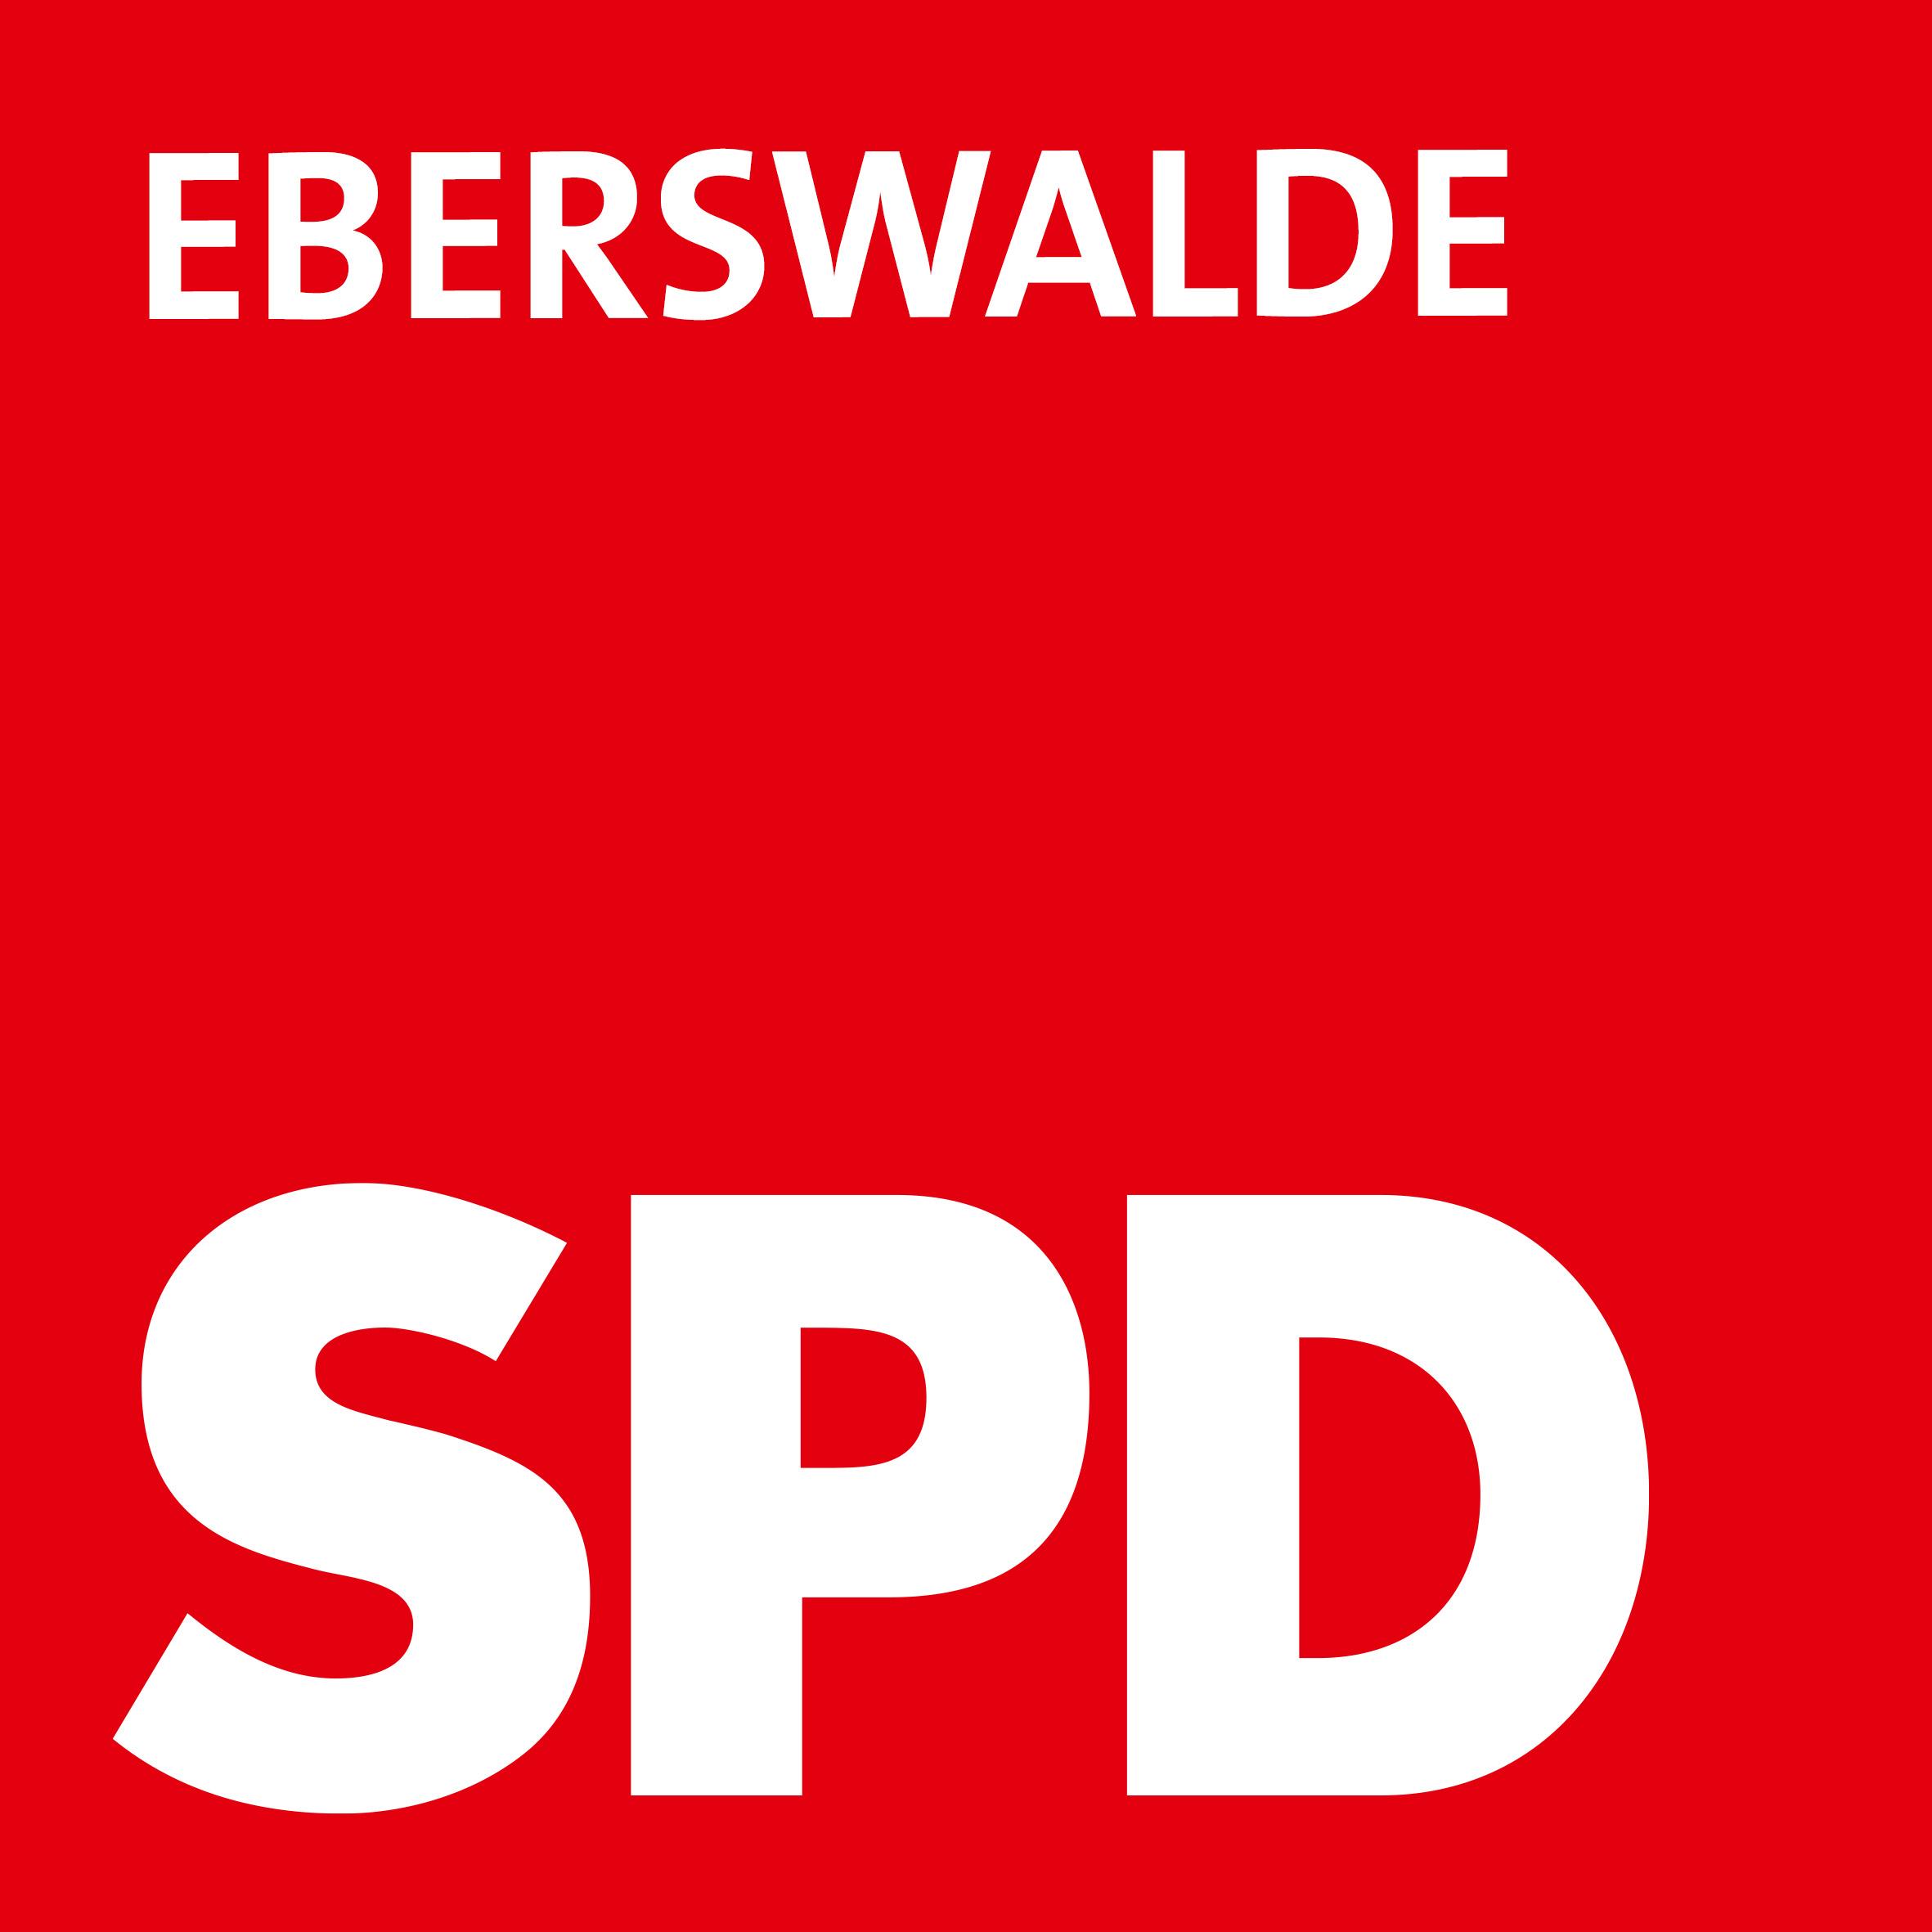 SPD Eberswalde